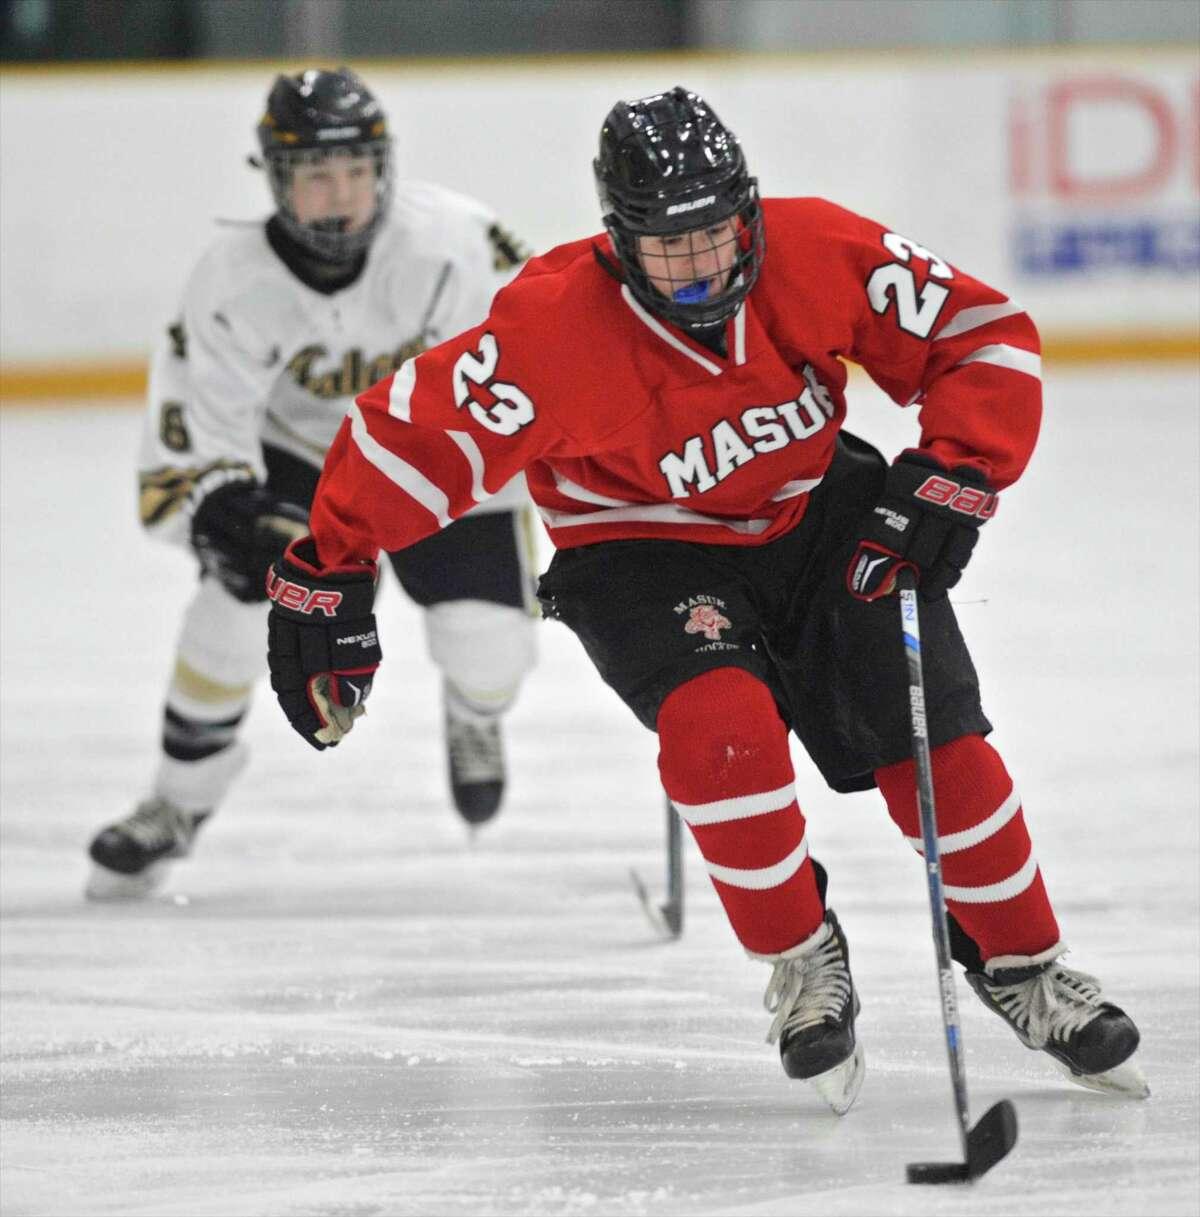 Masuk's Kyle Cirillo (23) brings the puck up-ice ahead of Barlow's Evan Baran (8) in the boys high school hockey game between Masuk and Joel Barlow high school on Saturday afternoon, January 14, 2017, at Danbury Ice Arena, Danbury, Conn.